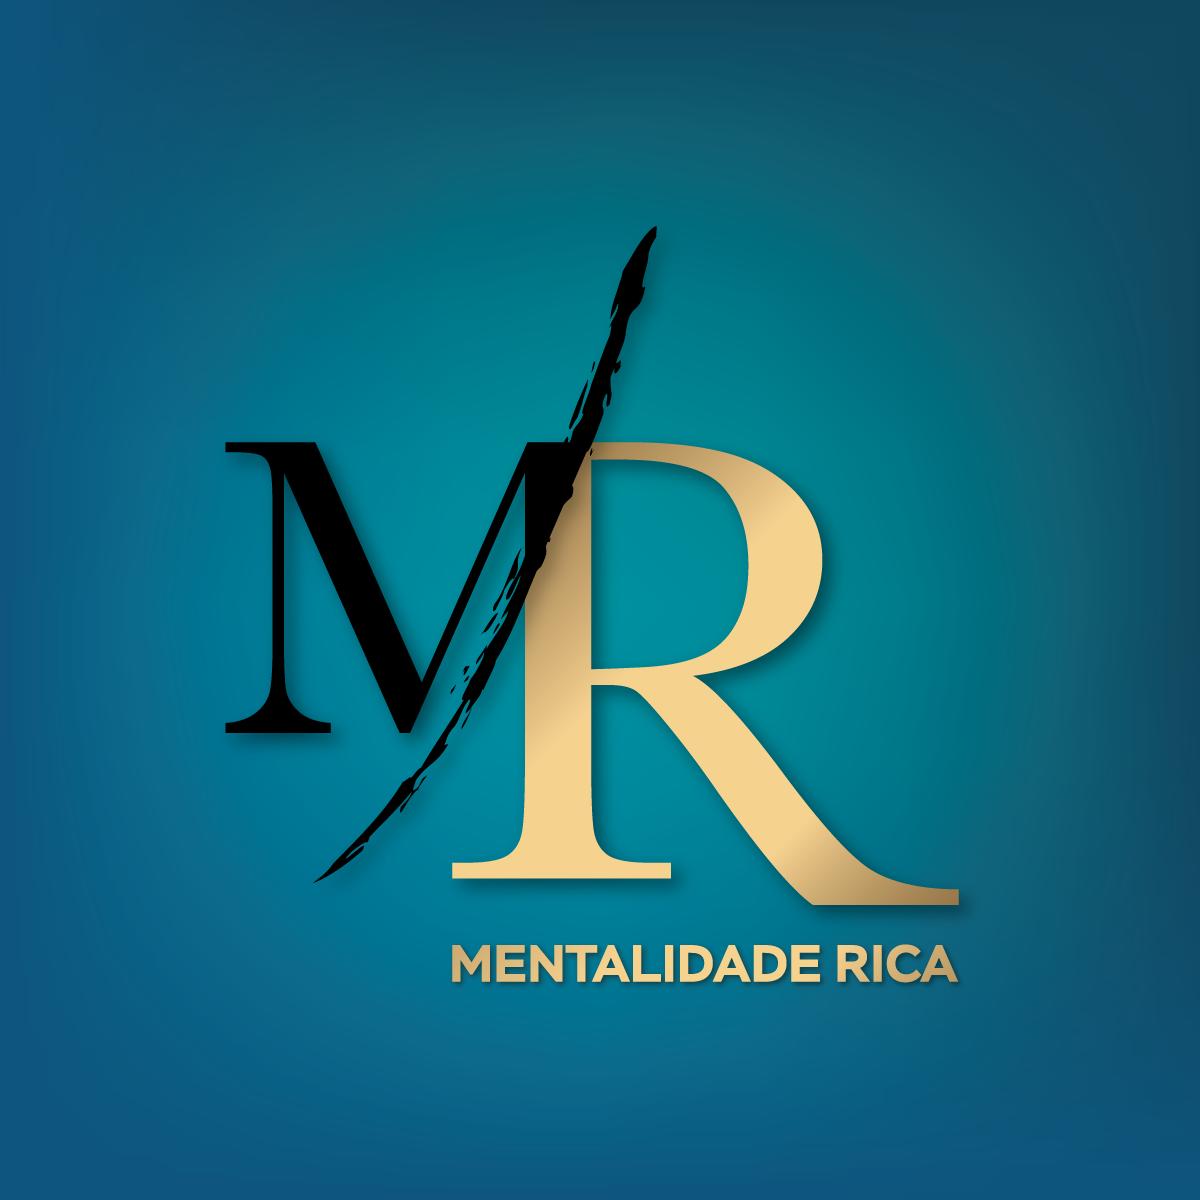 Mentalidade Rica